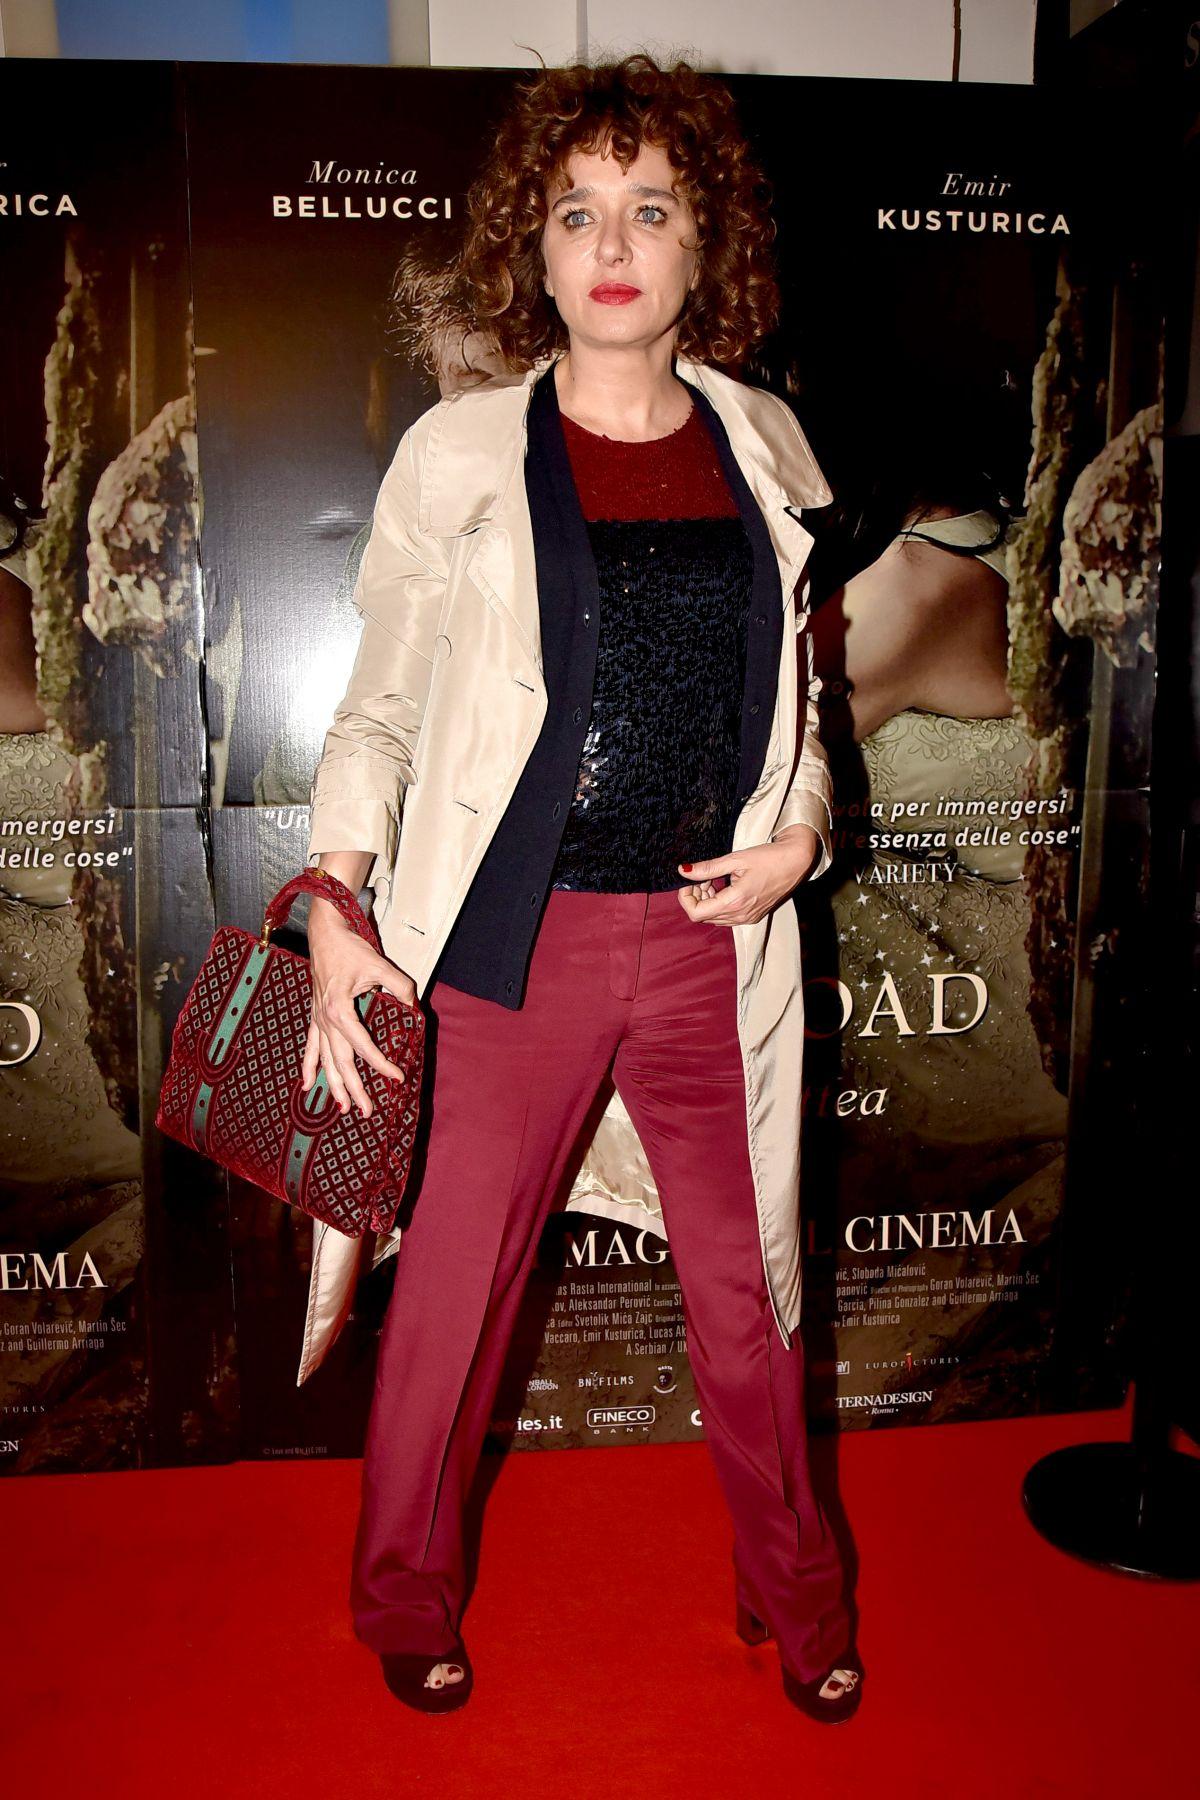 VALERIA GOLINO at On the Milky Road Premiere in Rome 05/08 ...